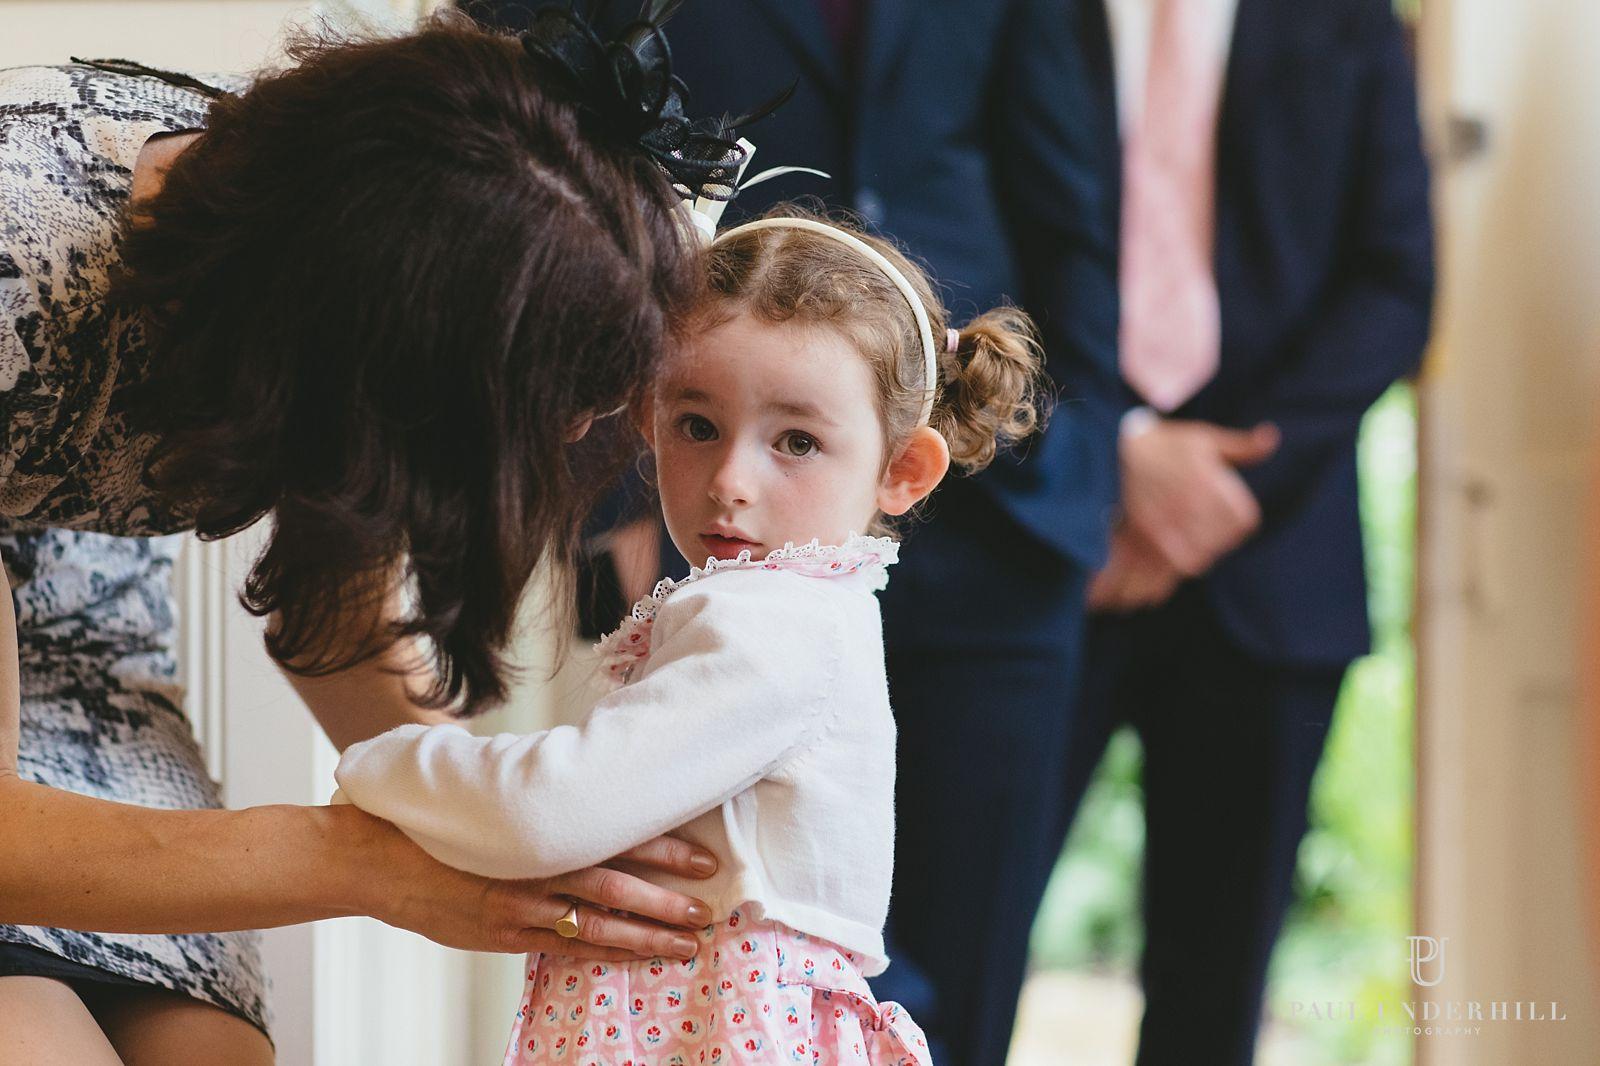 Reportage wedding photography Dorset